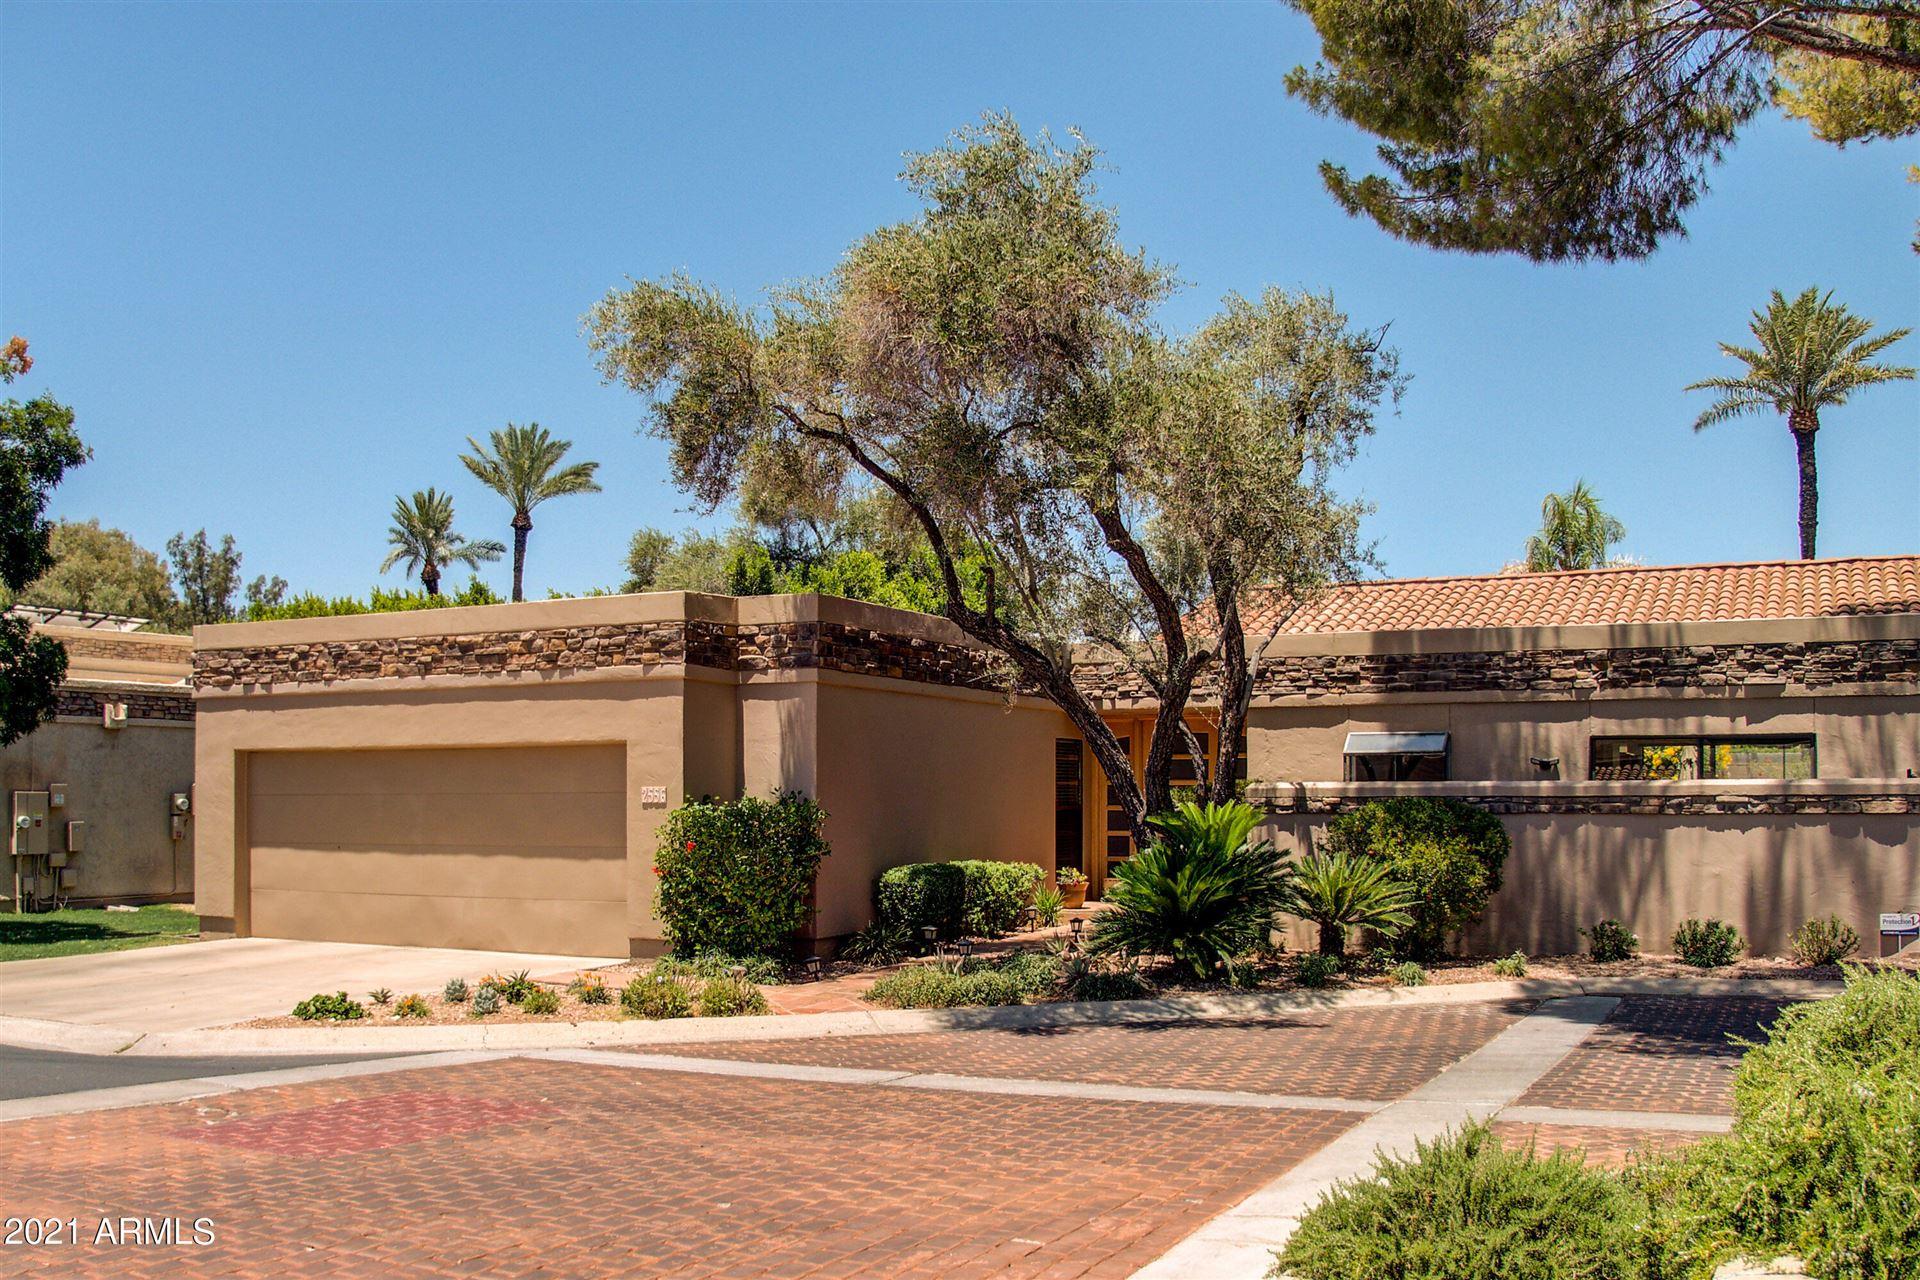 2556 E MISSOURI Avenue, Phoenix, AZ 85016 - MLS#: 6244417